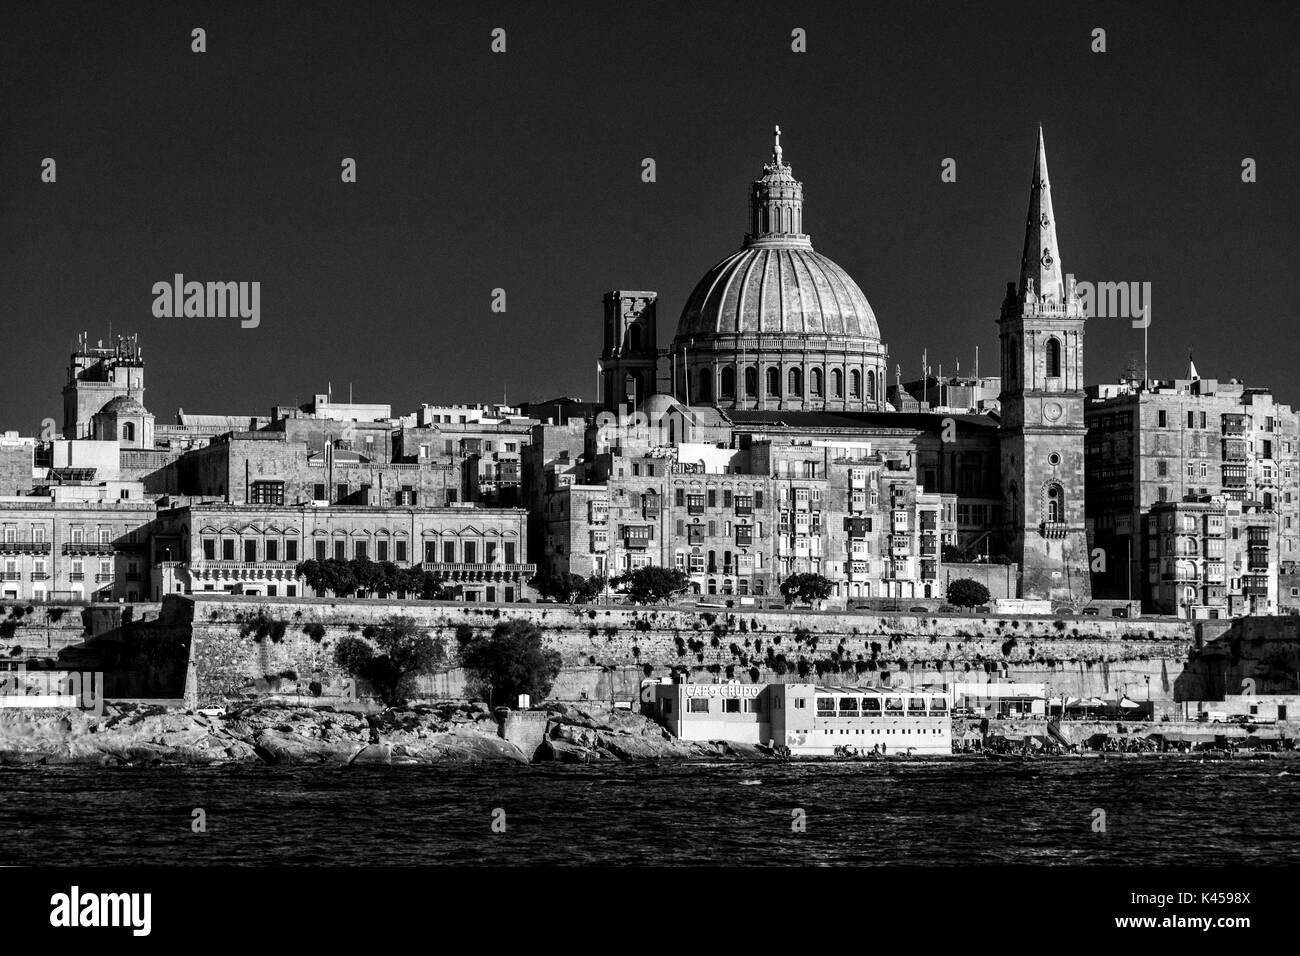 Black and White scenic summer view of Valletta, capital of Malta, across from Sliema, looking over Marsamxett Harbour - Stock Image